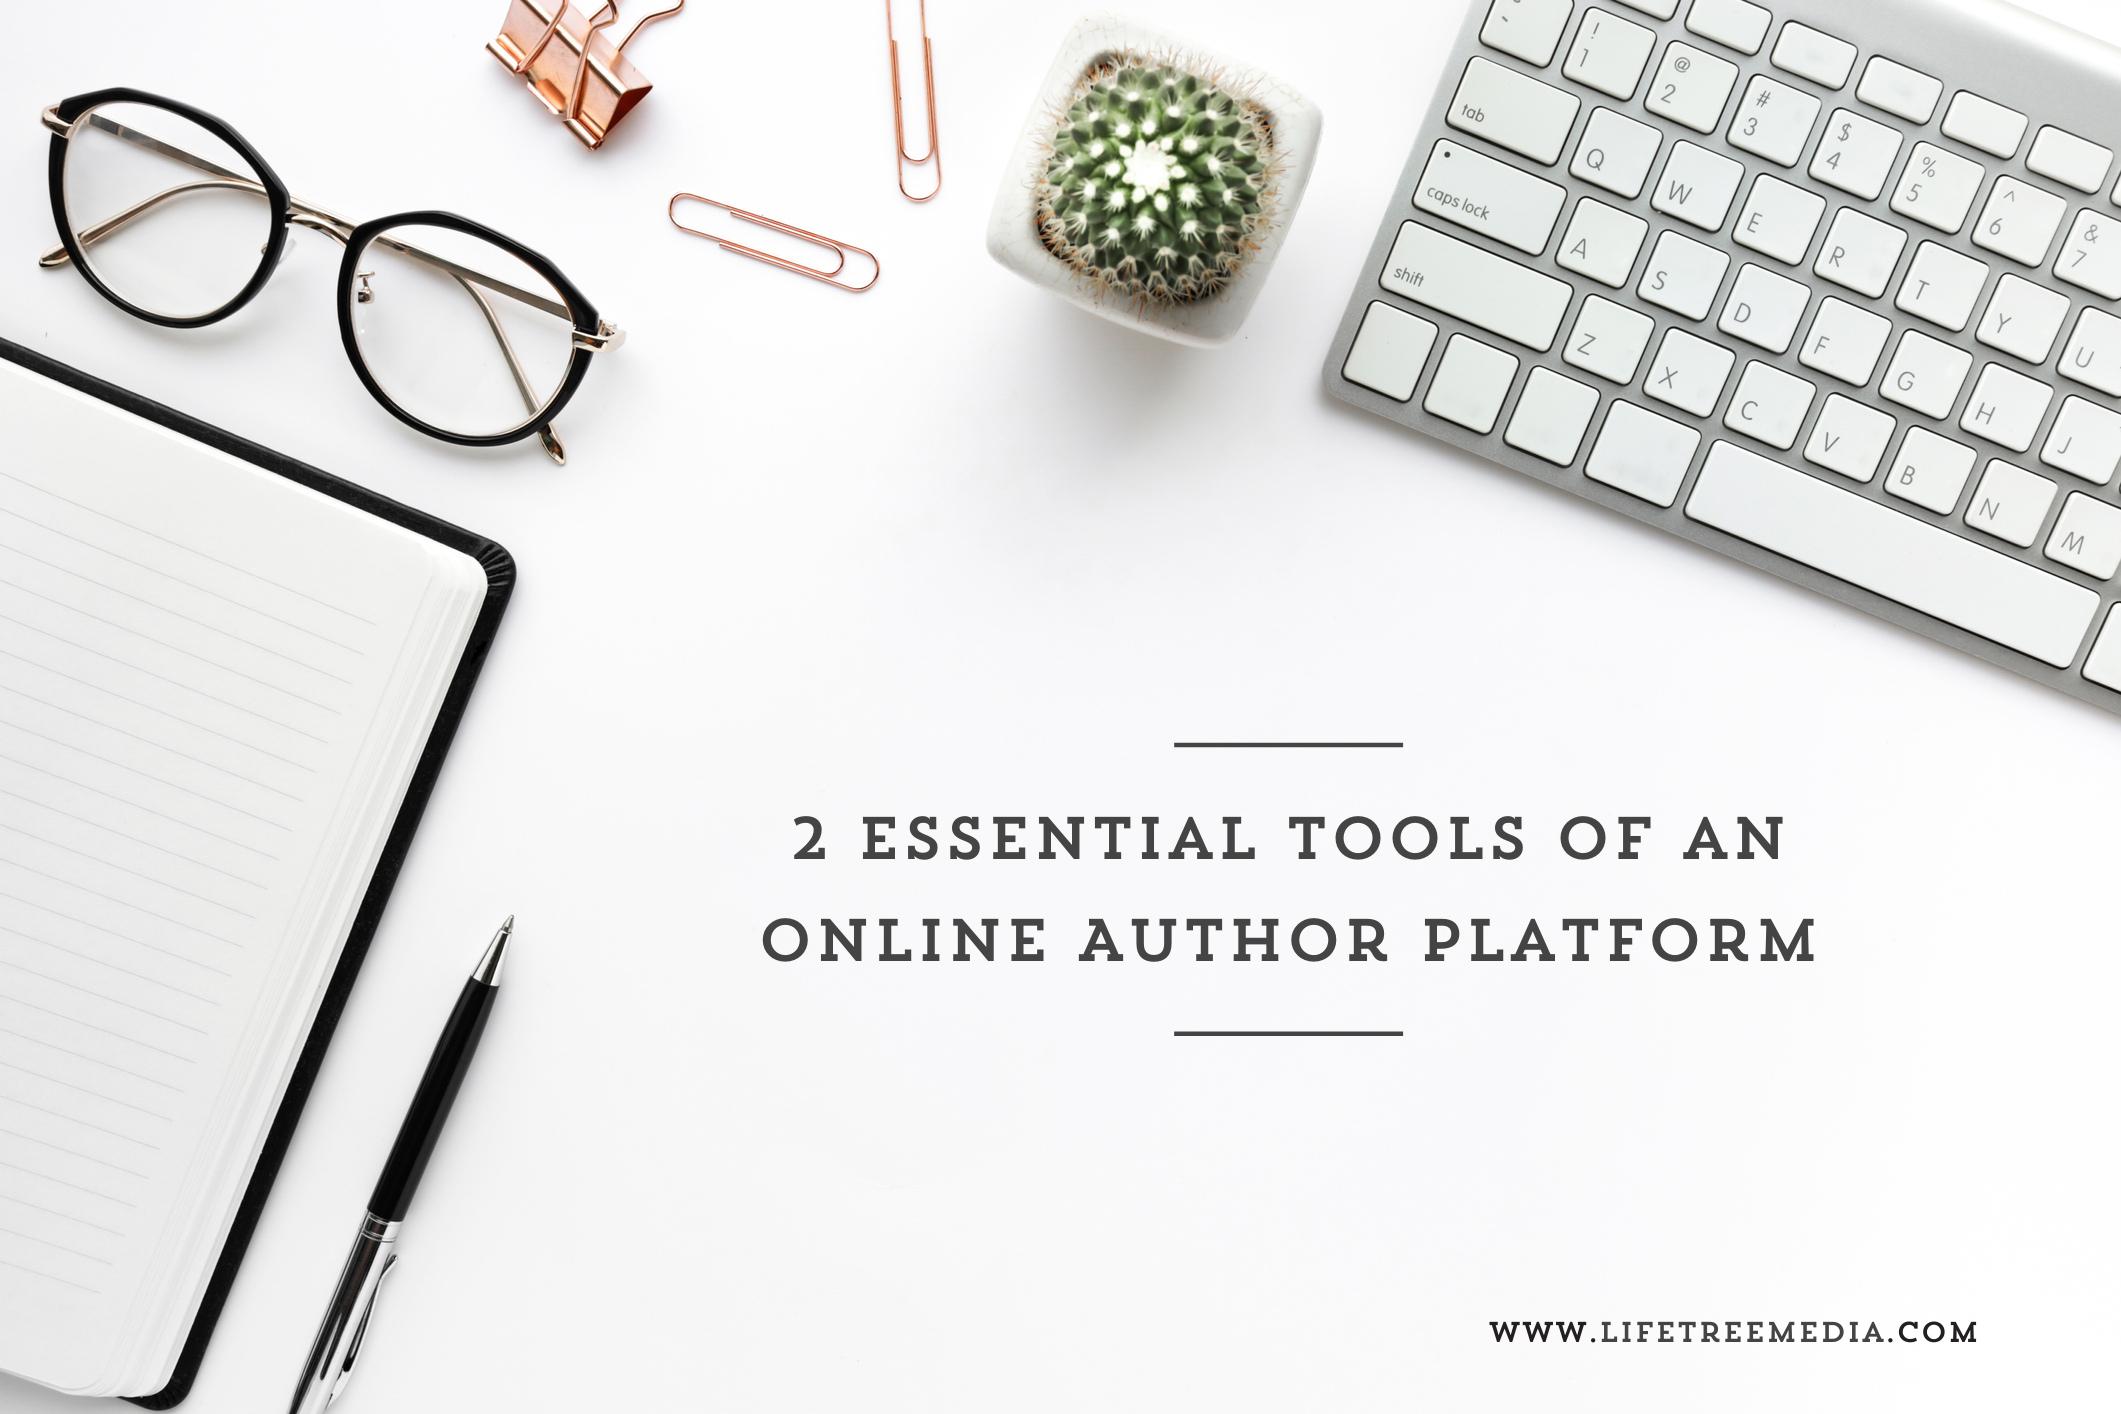 2 essential tools of an online author platform